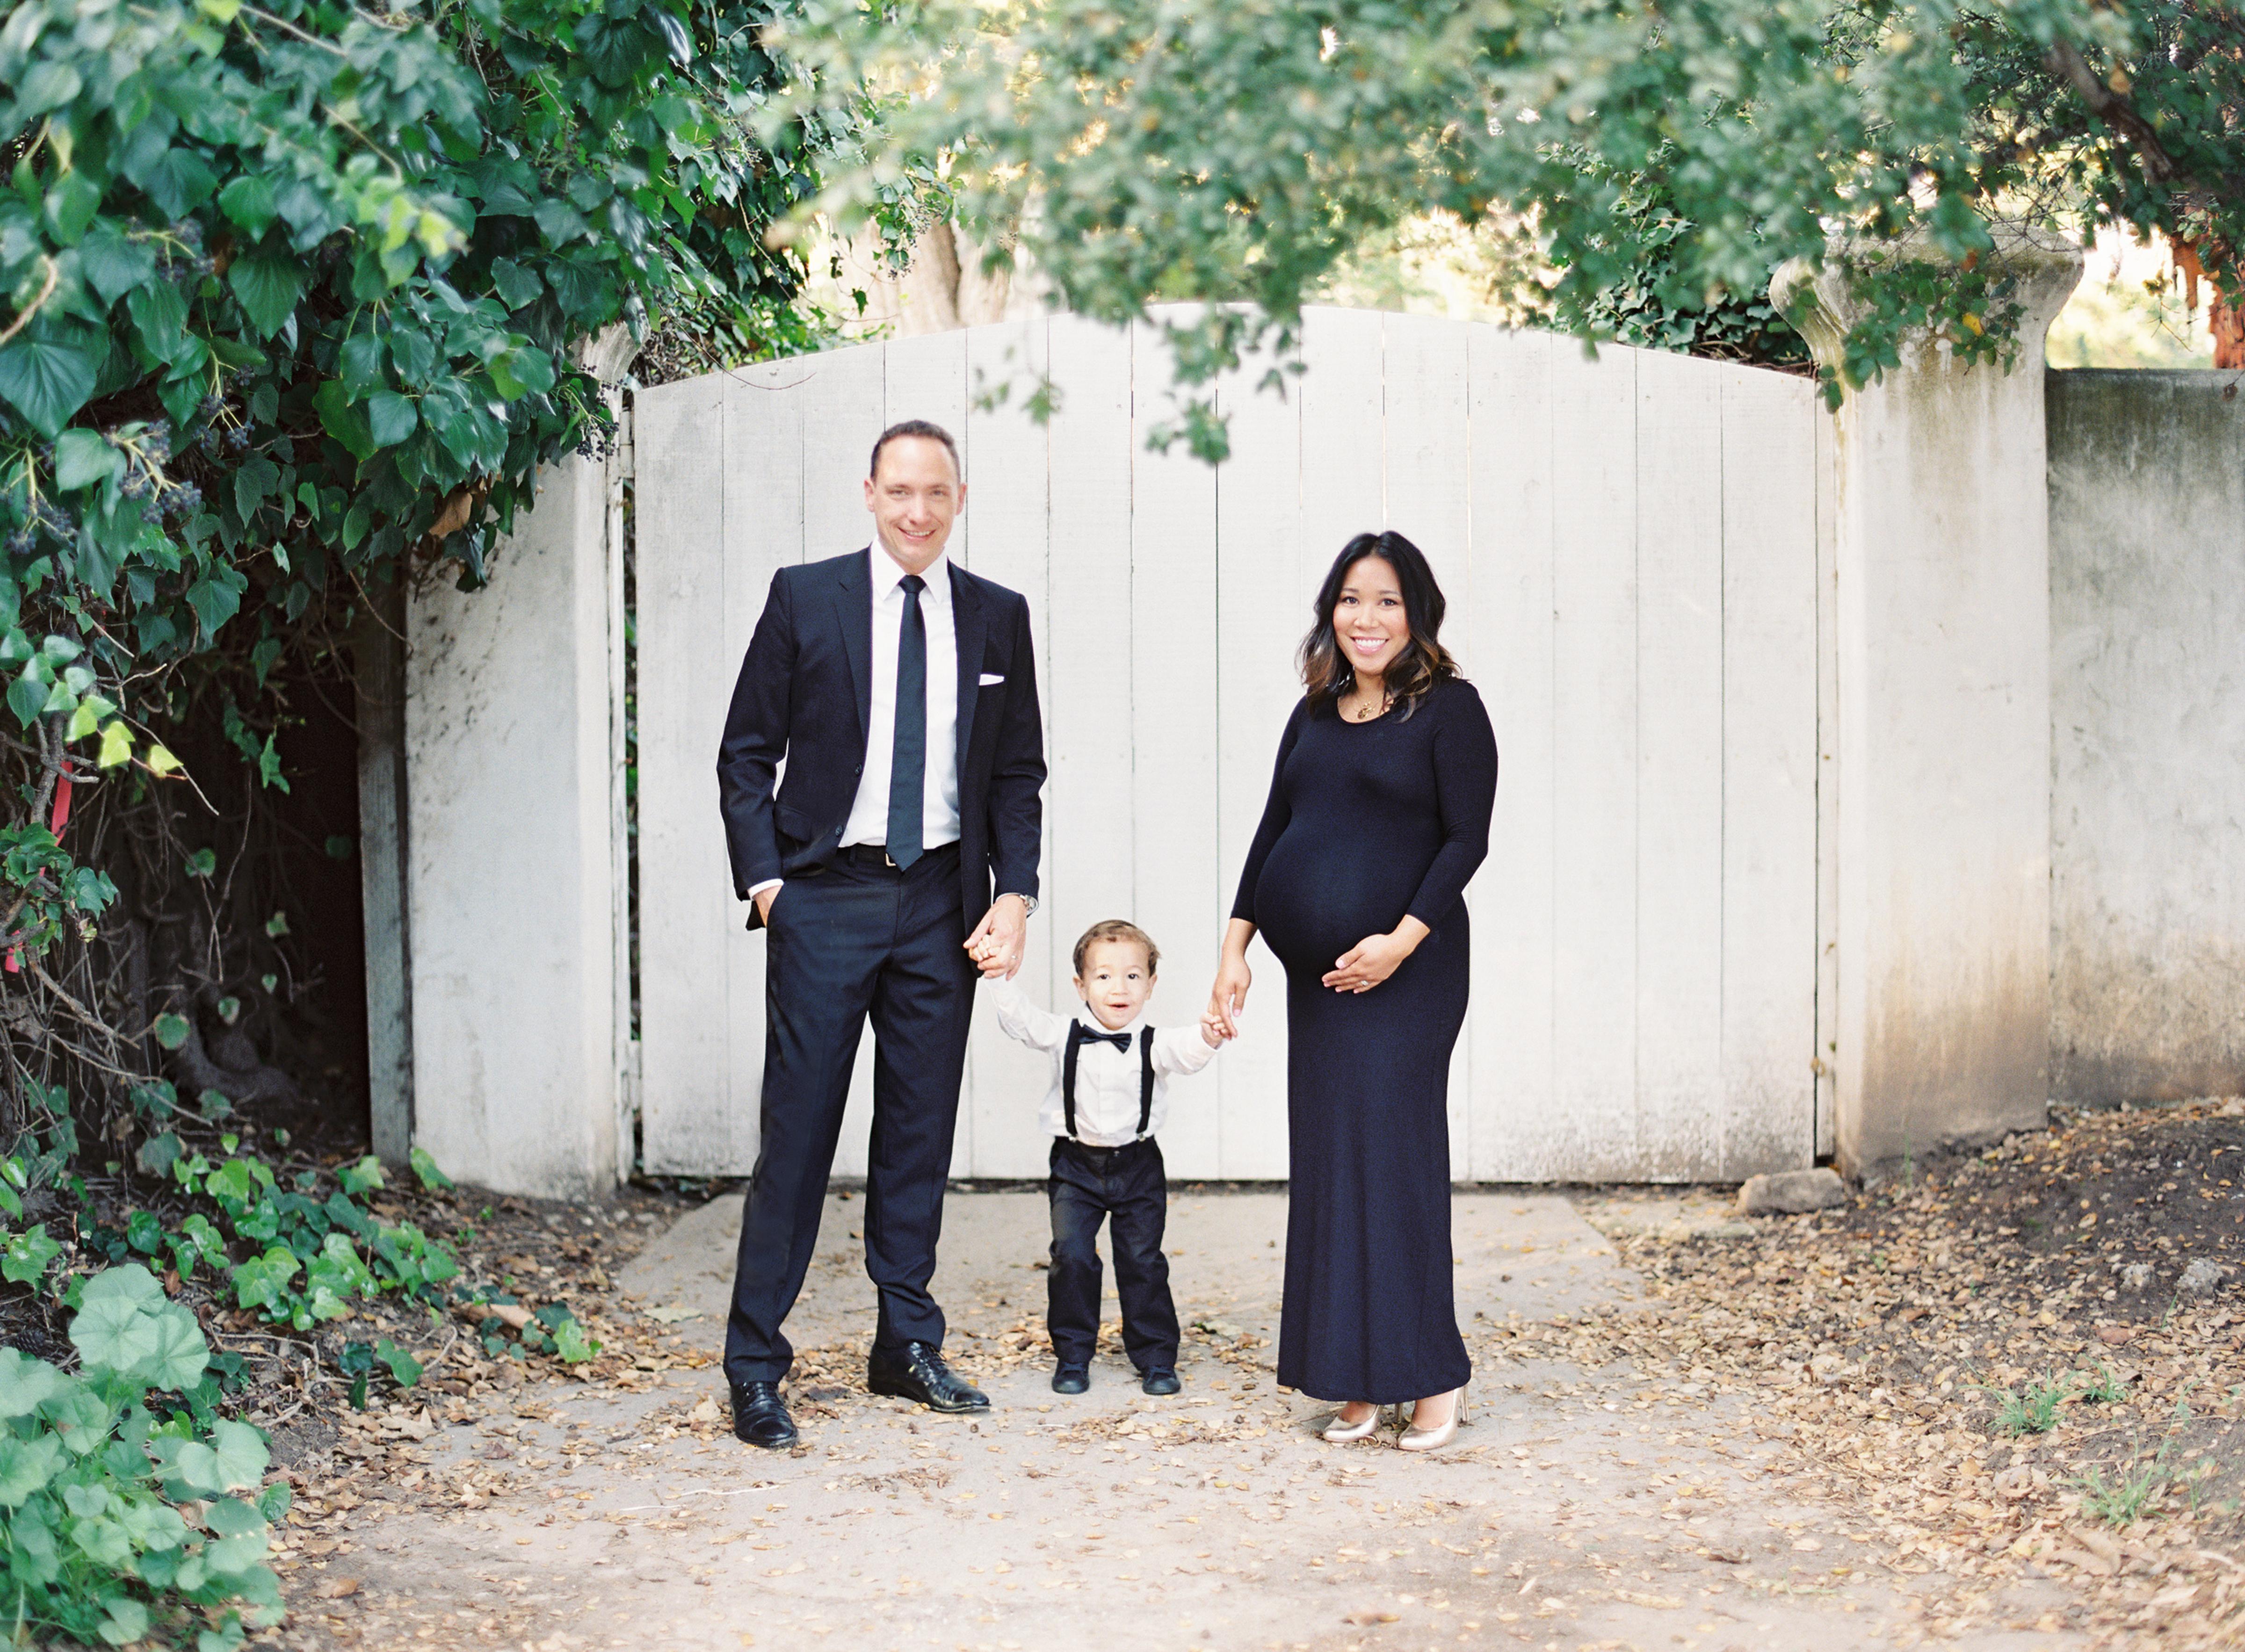 thegreatromance-family portrait-maternity